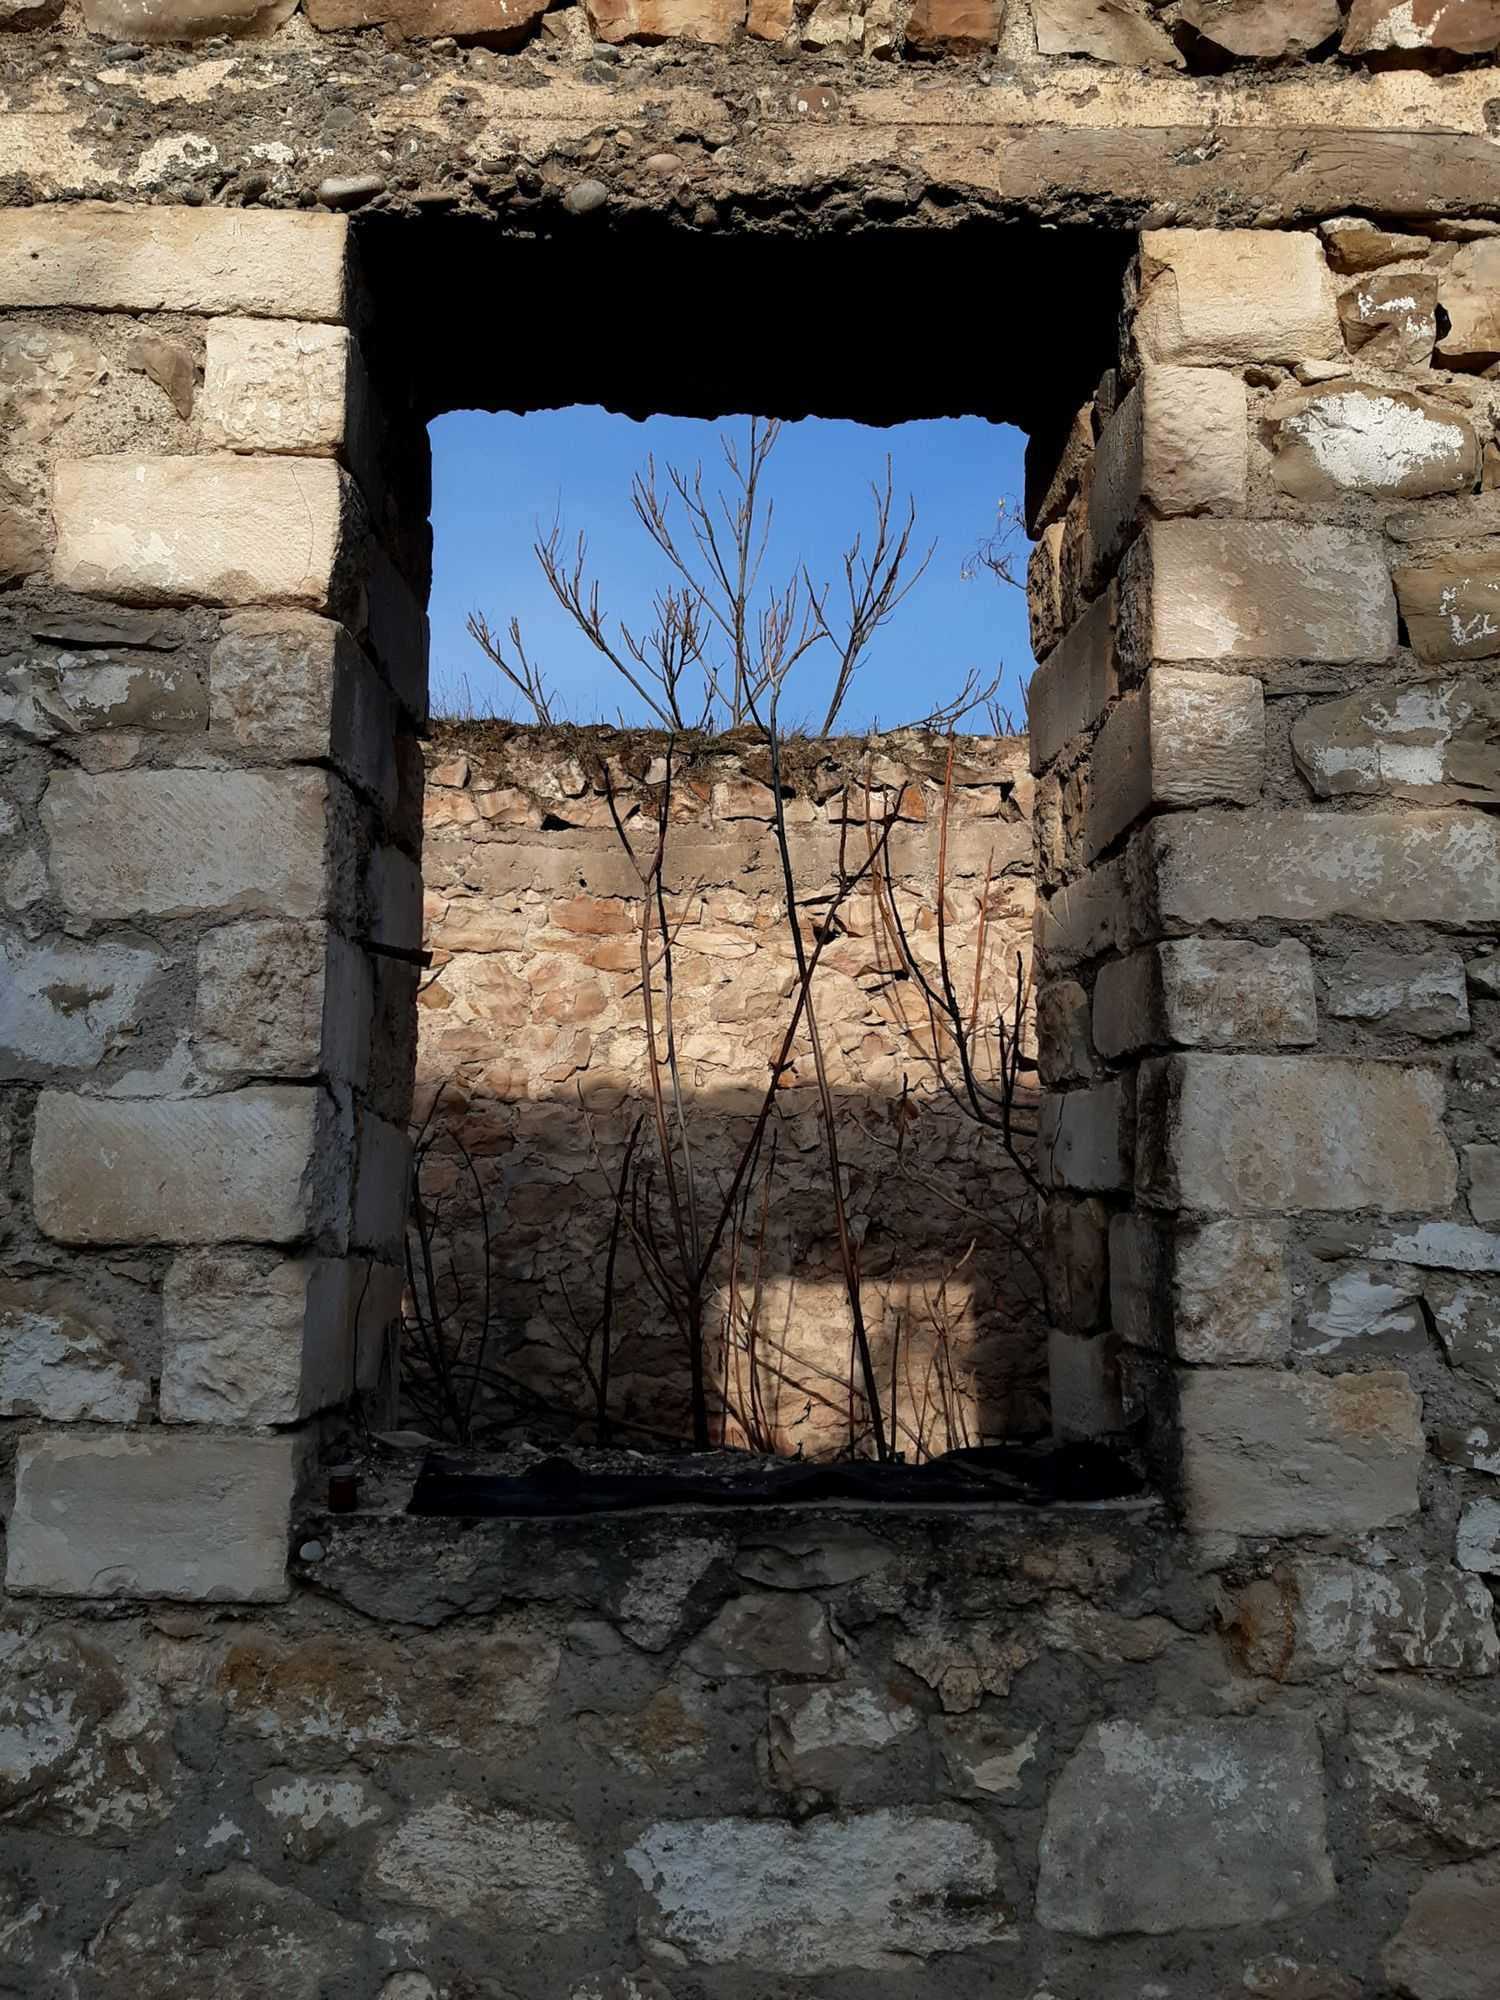 gohar martirosyan1 1 - February in Stepanakert